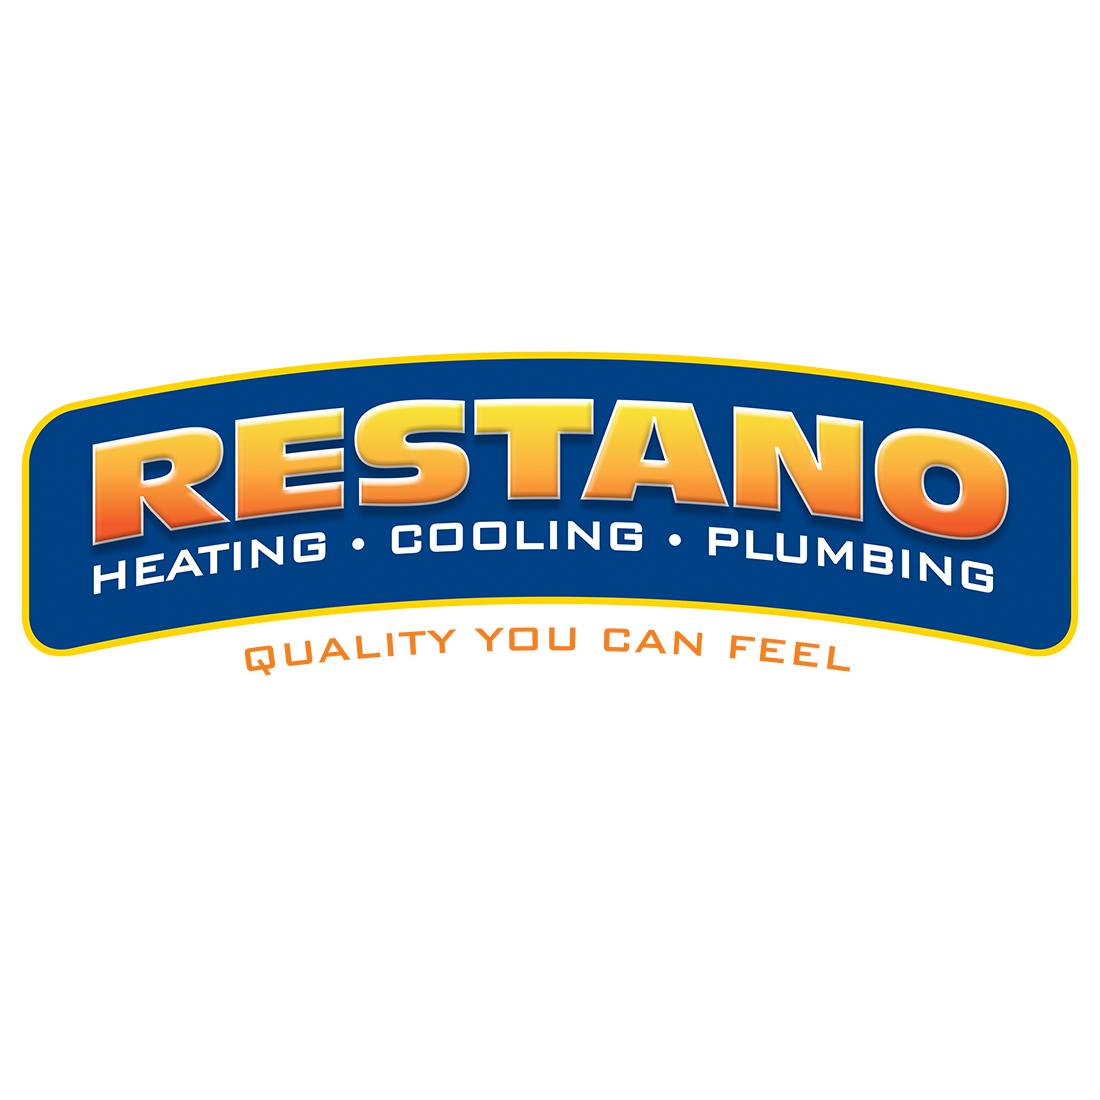 Restano Heating, Cooling & Plumbing - Murrysville, PA 15668 - (724)327-7137   ShowMeLocal.com